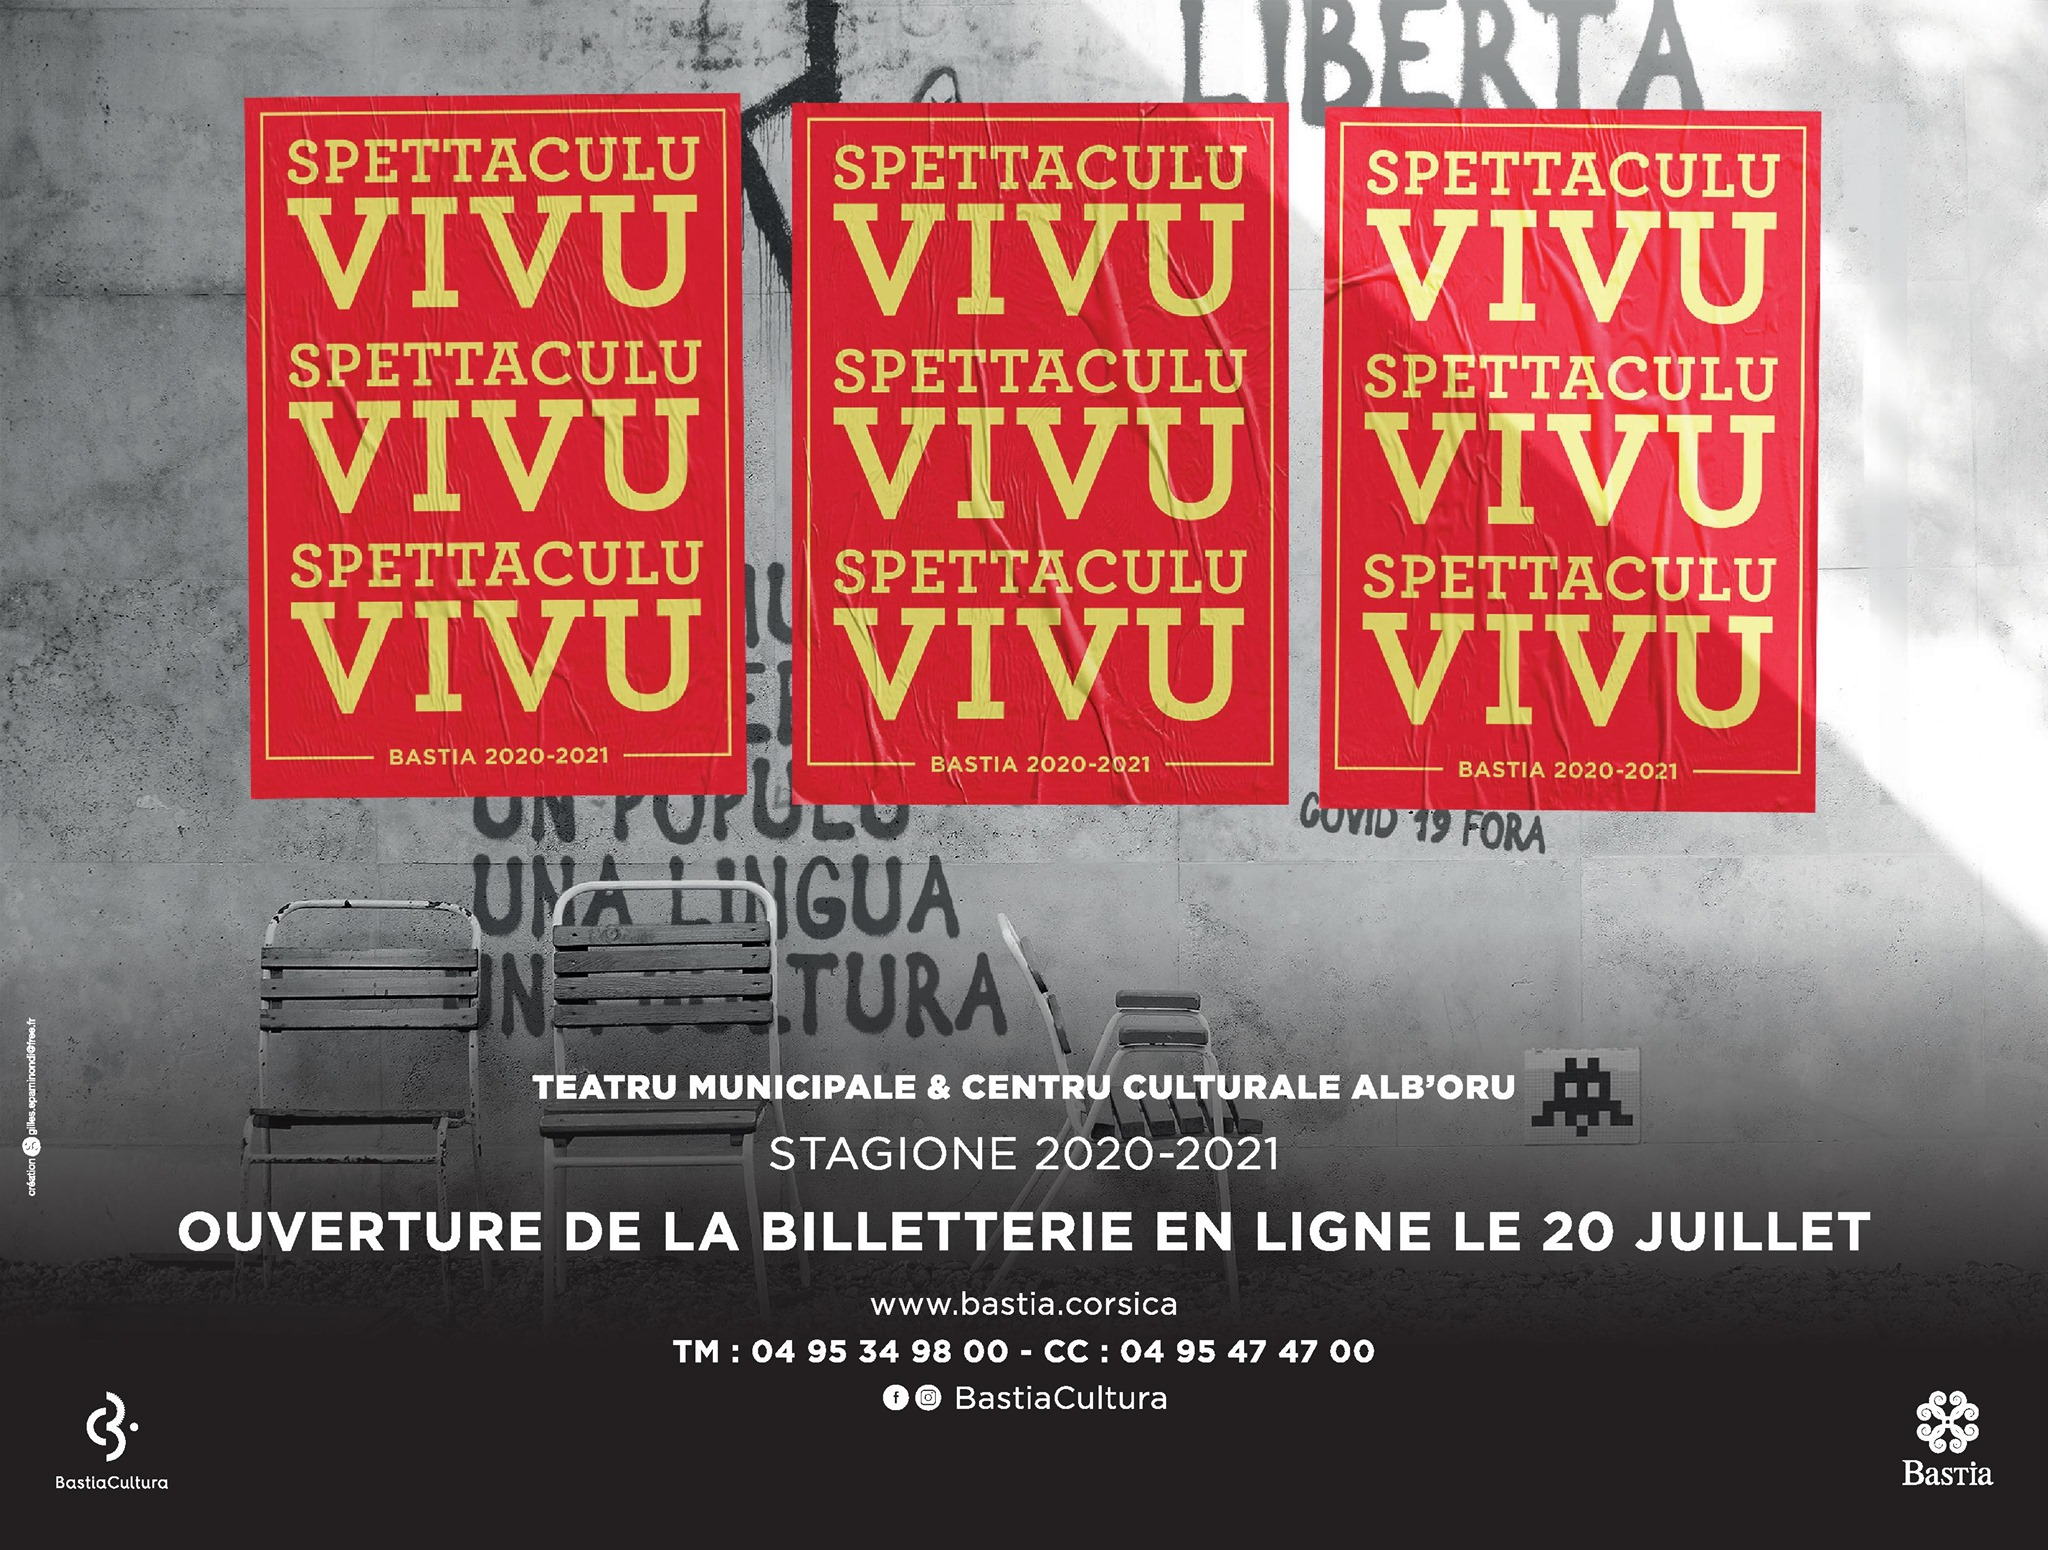 Bastia Cultura / Spettaculu vivu : Comment se faire rembourser ?